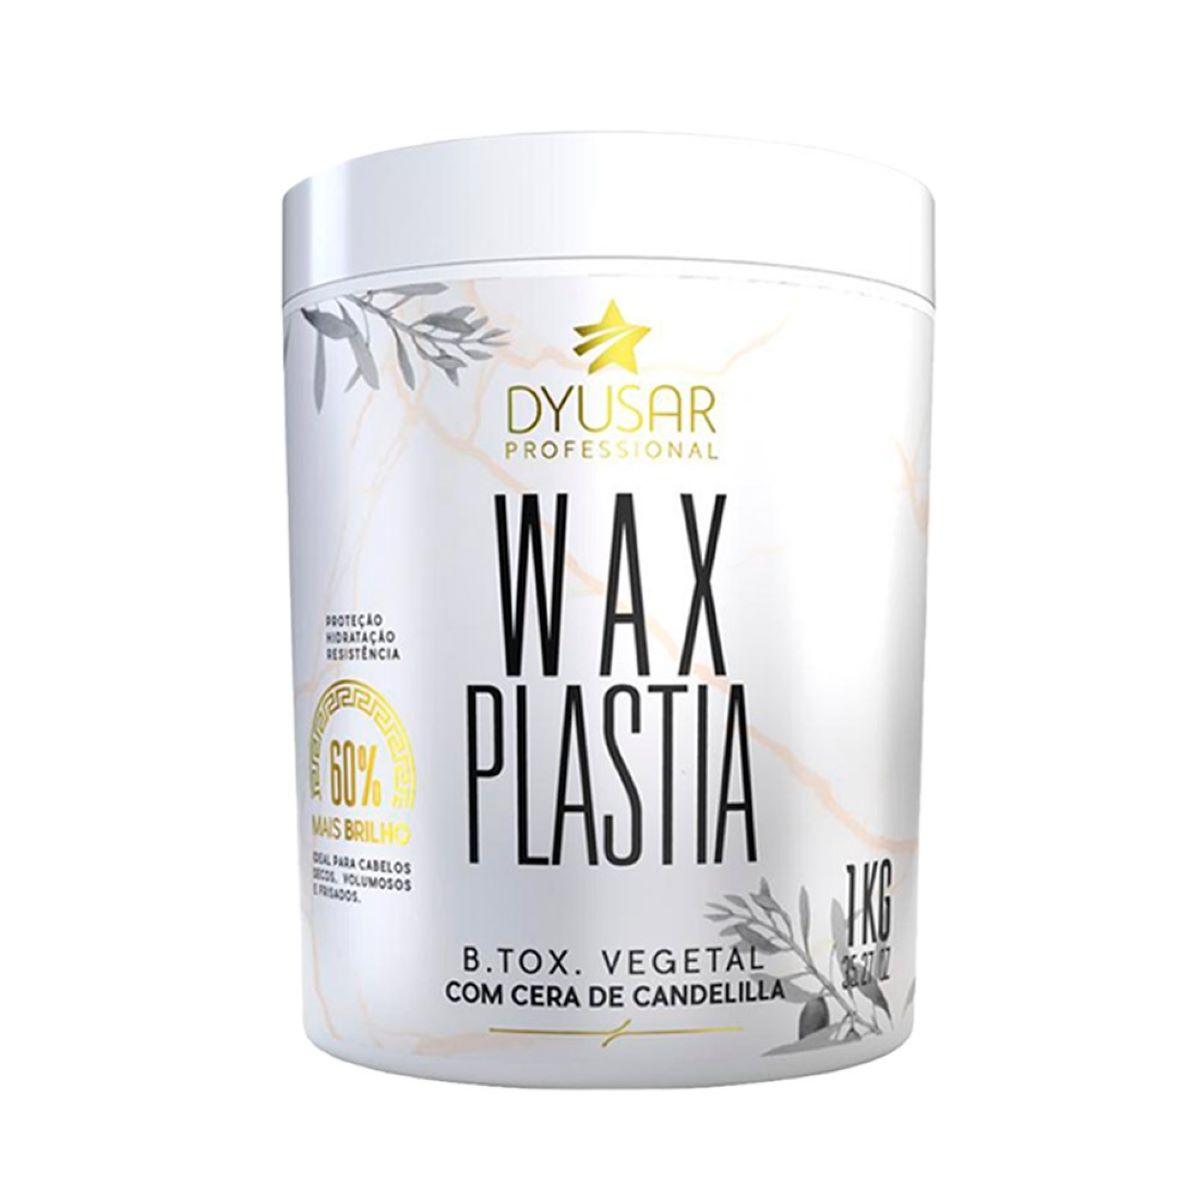 B.tox Vegetal Wax Plastia DYUSAR COSMÉTICOS PROFISSIONAL 1KG